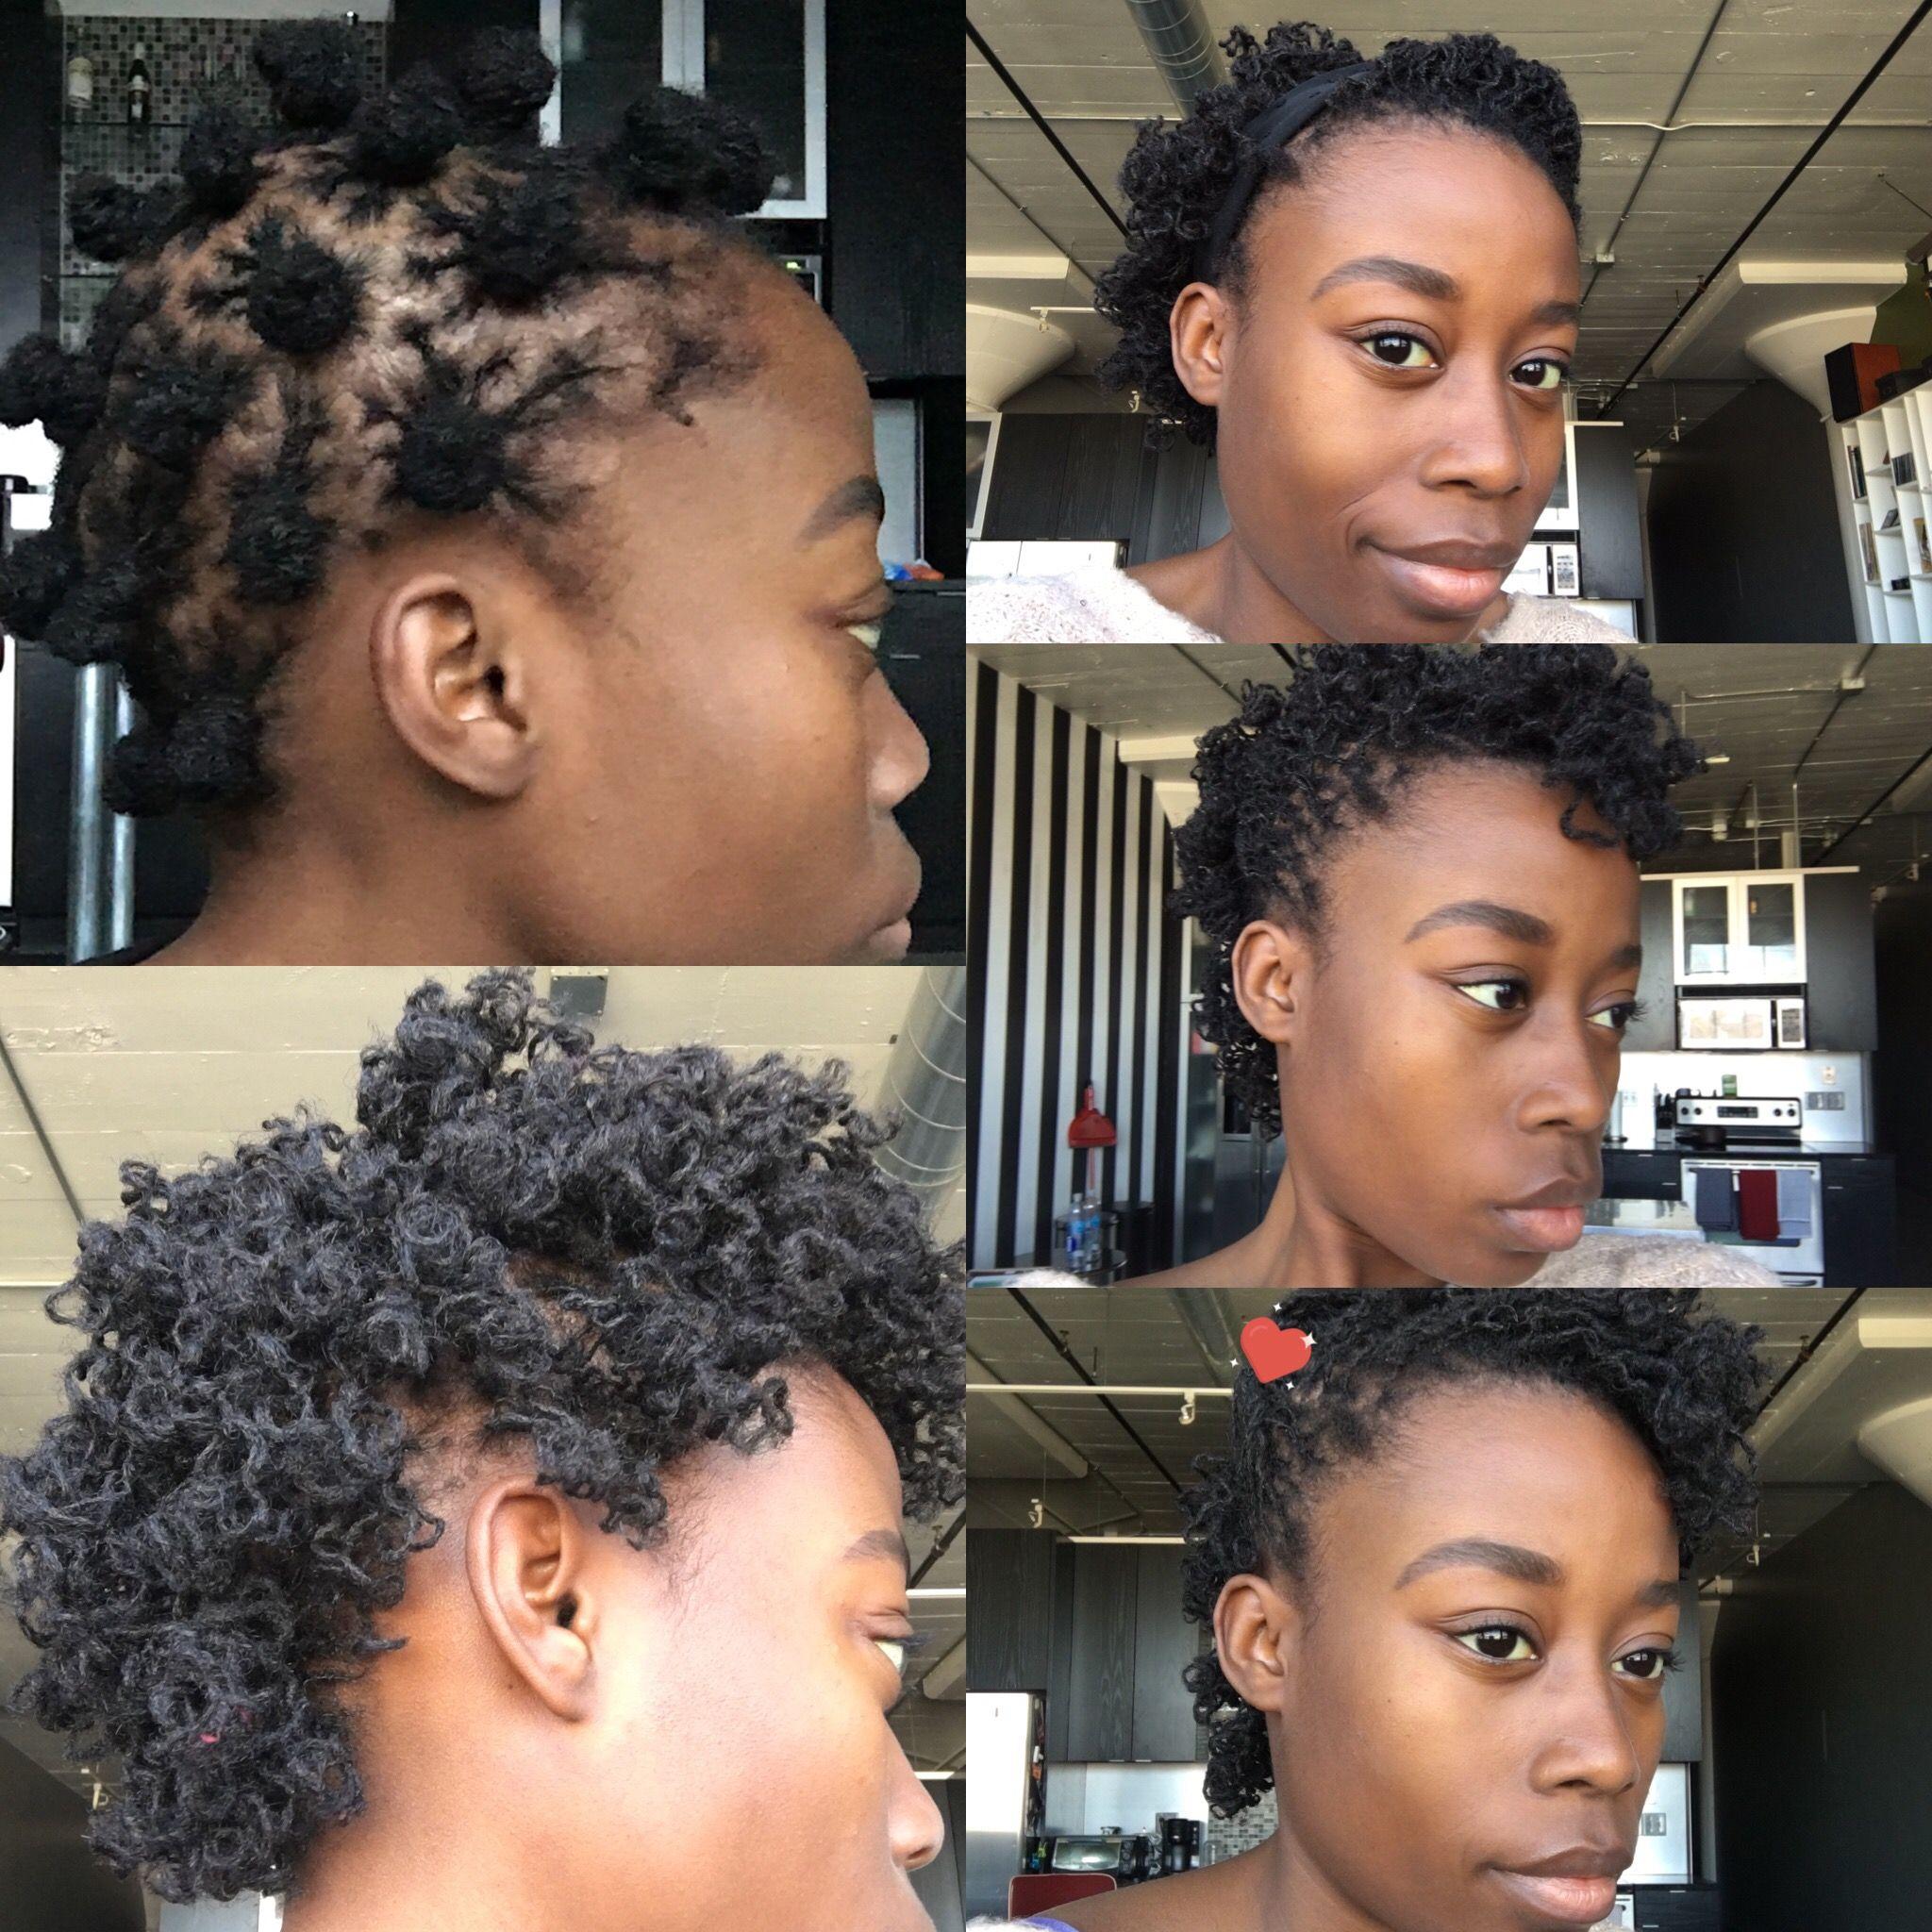 bantu knots on short sisterlocks! plus 3 quick styles!! | loc